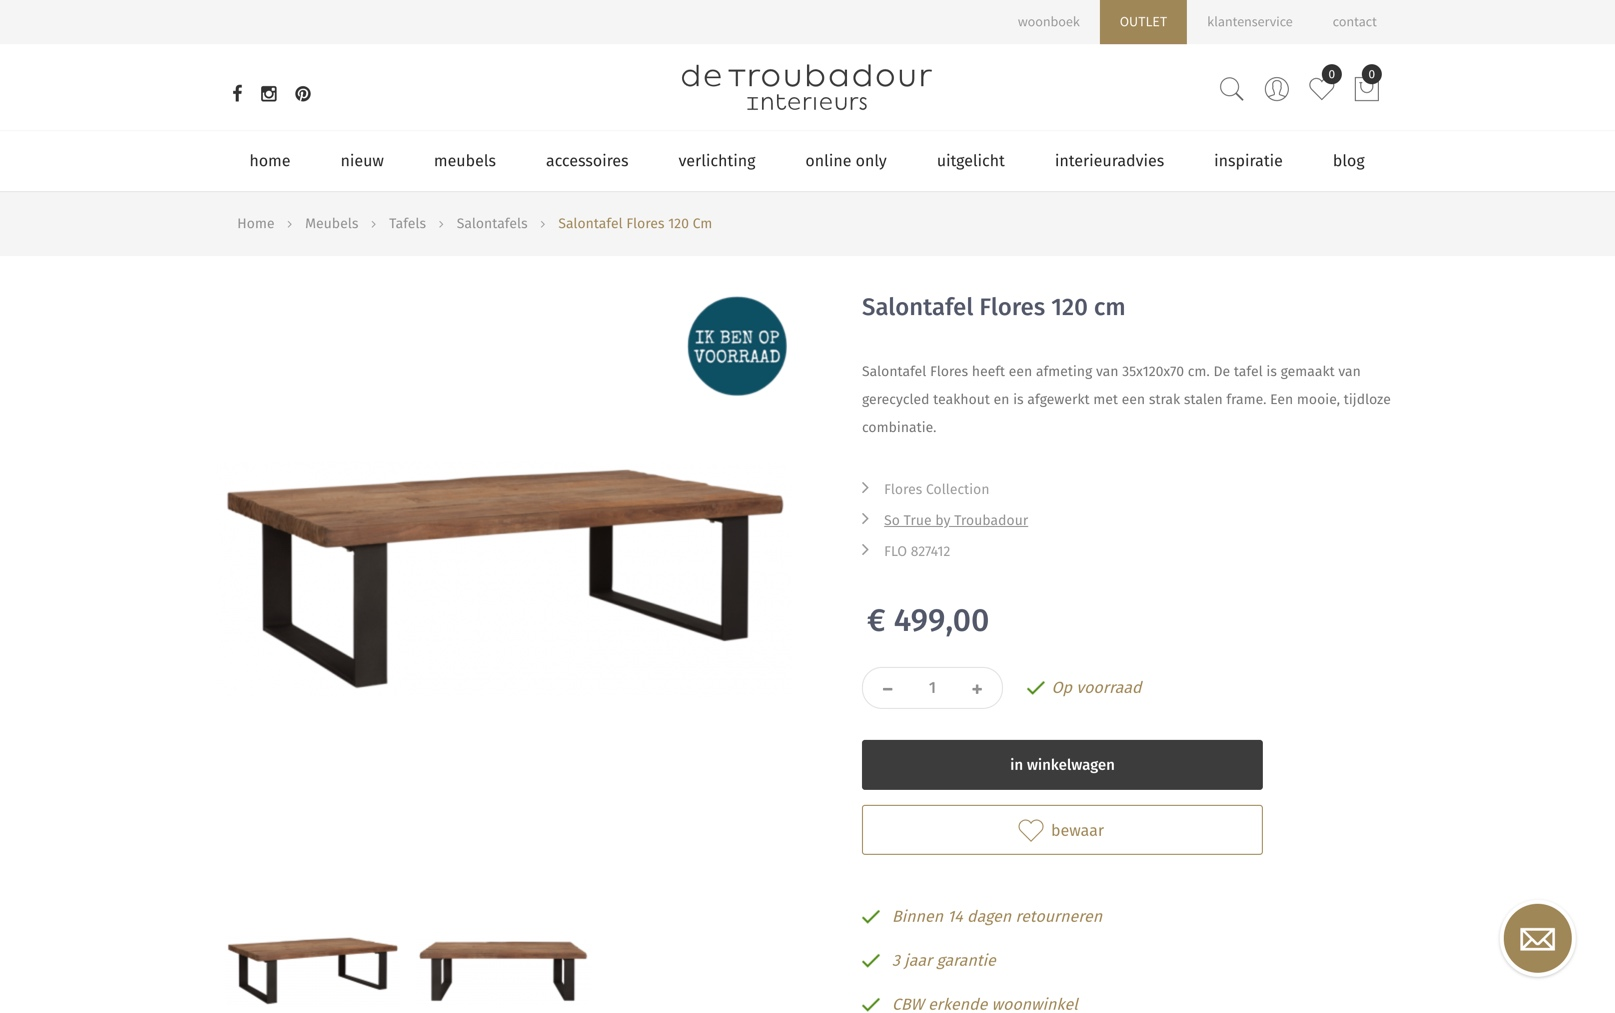 detroubadour-website3